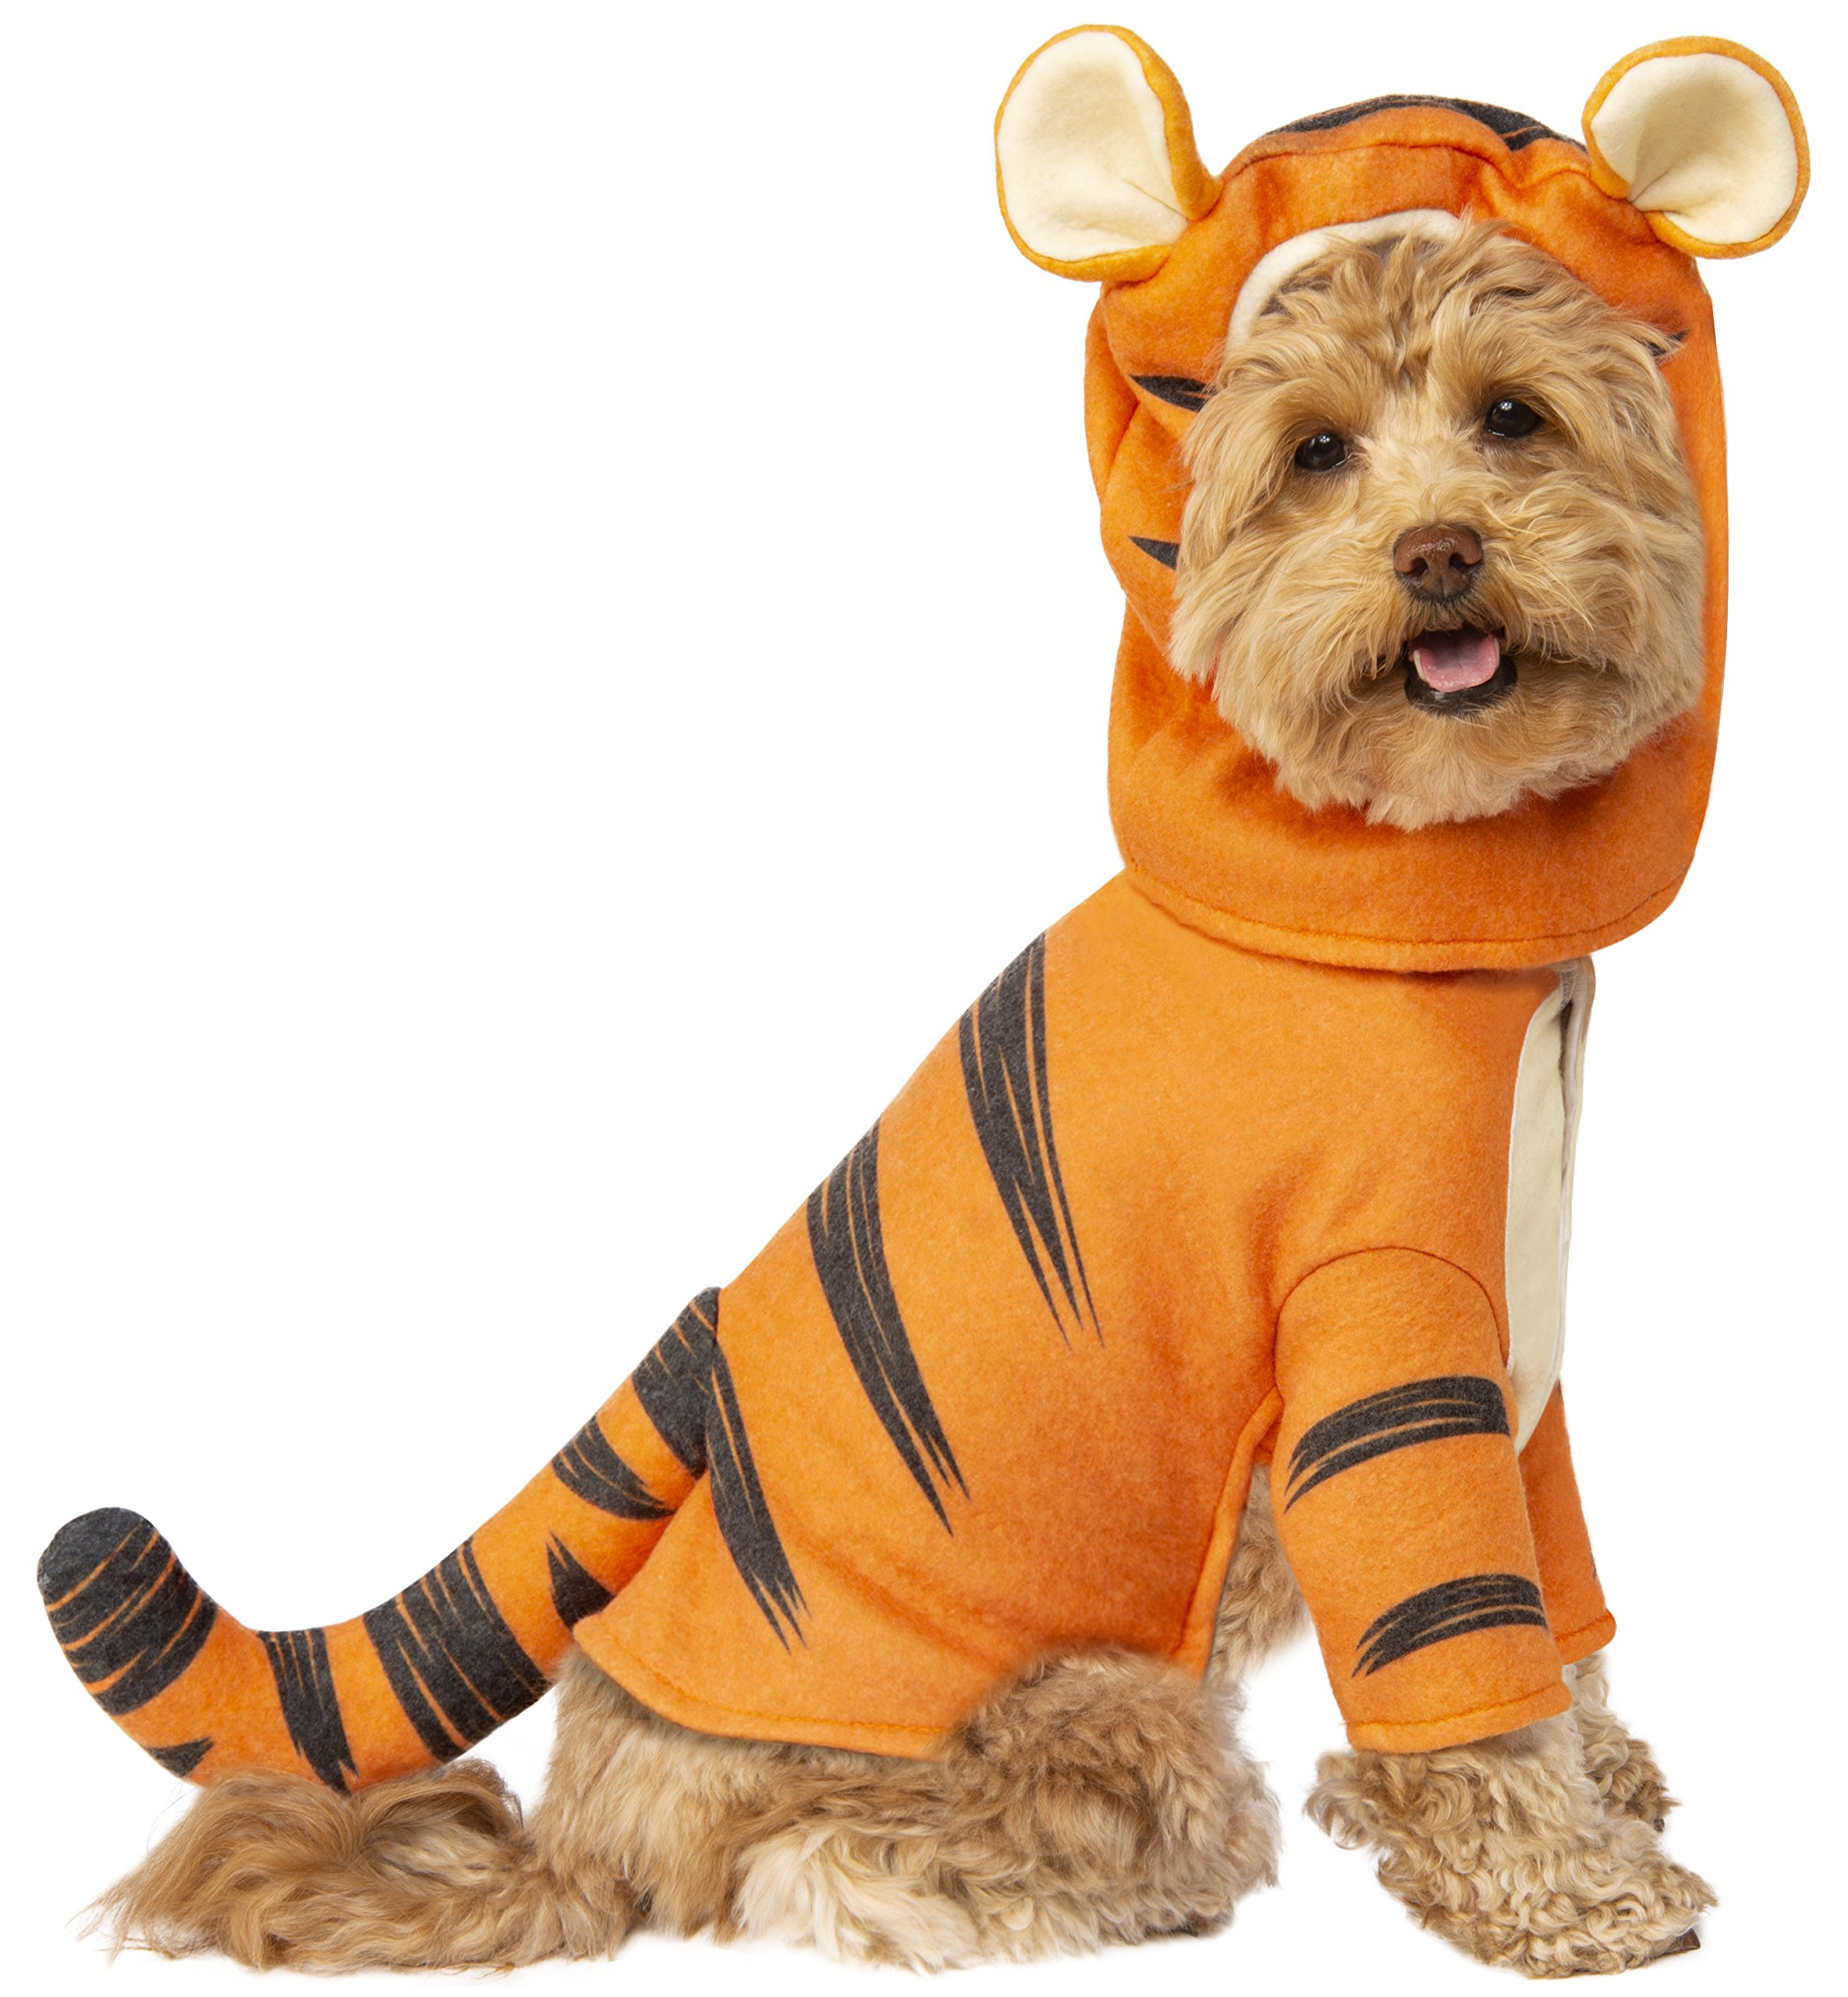 Rubie's Disney: Winnie the Pooh Pet Costume, Tigger, Medium by Rubie's (Image #1)